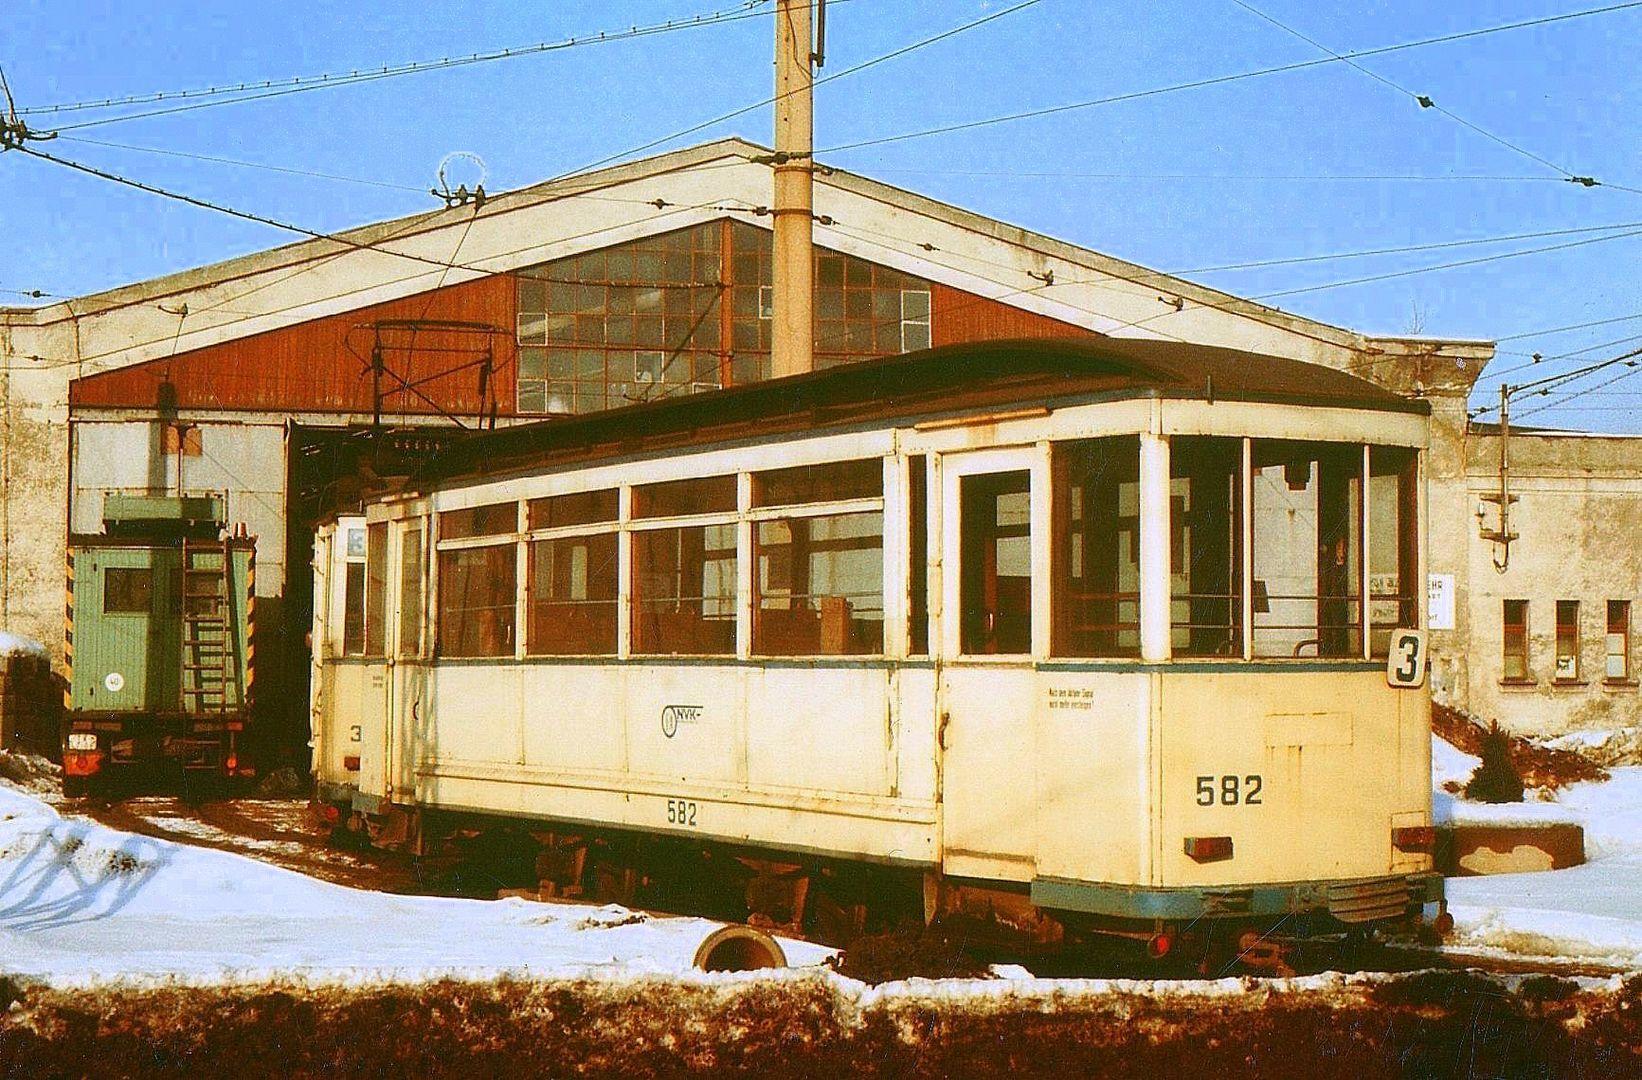 1986 Berufsverkehr E Zug